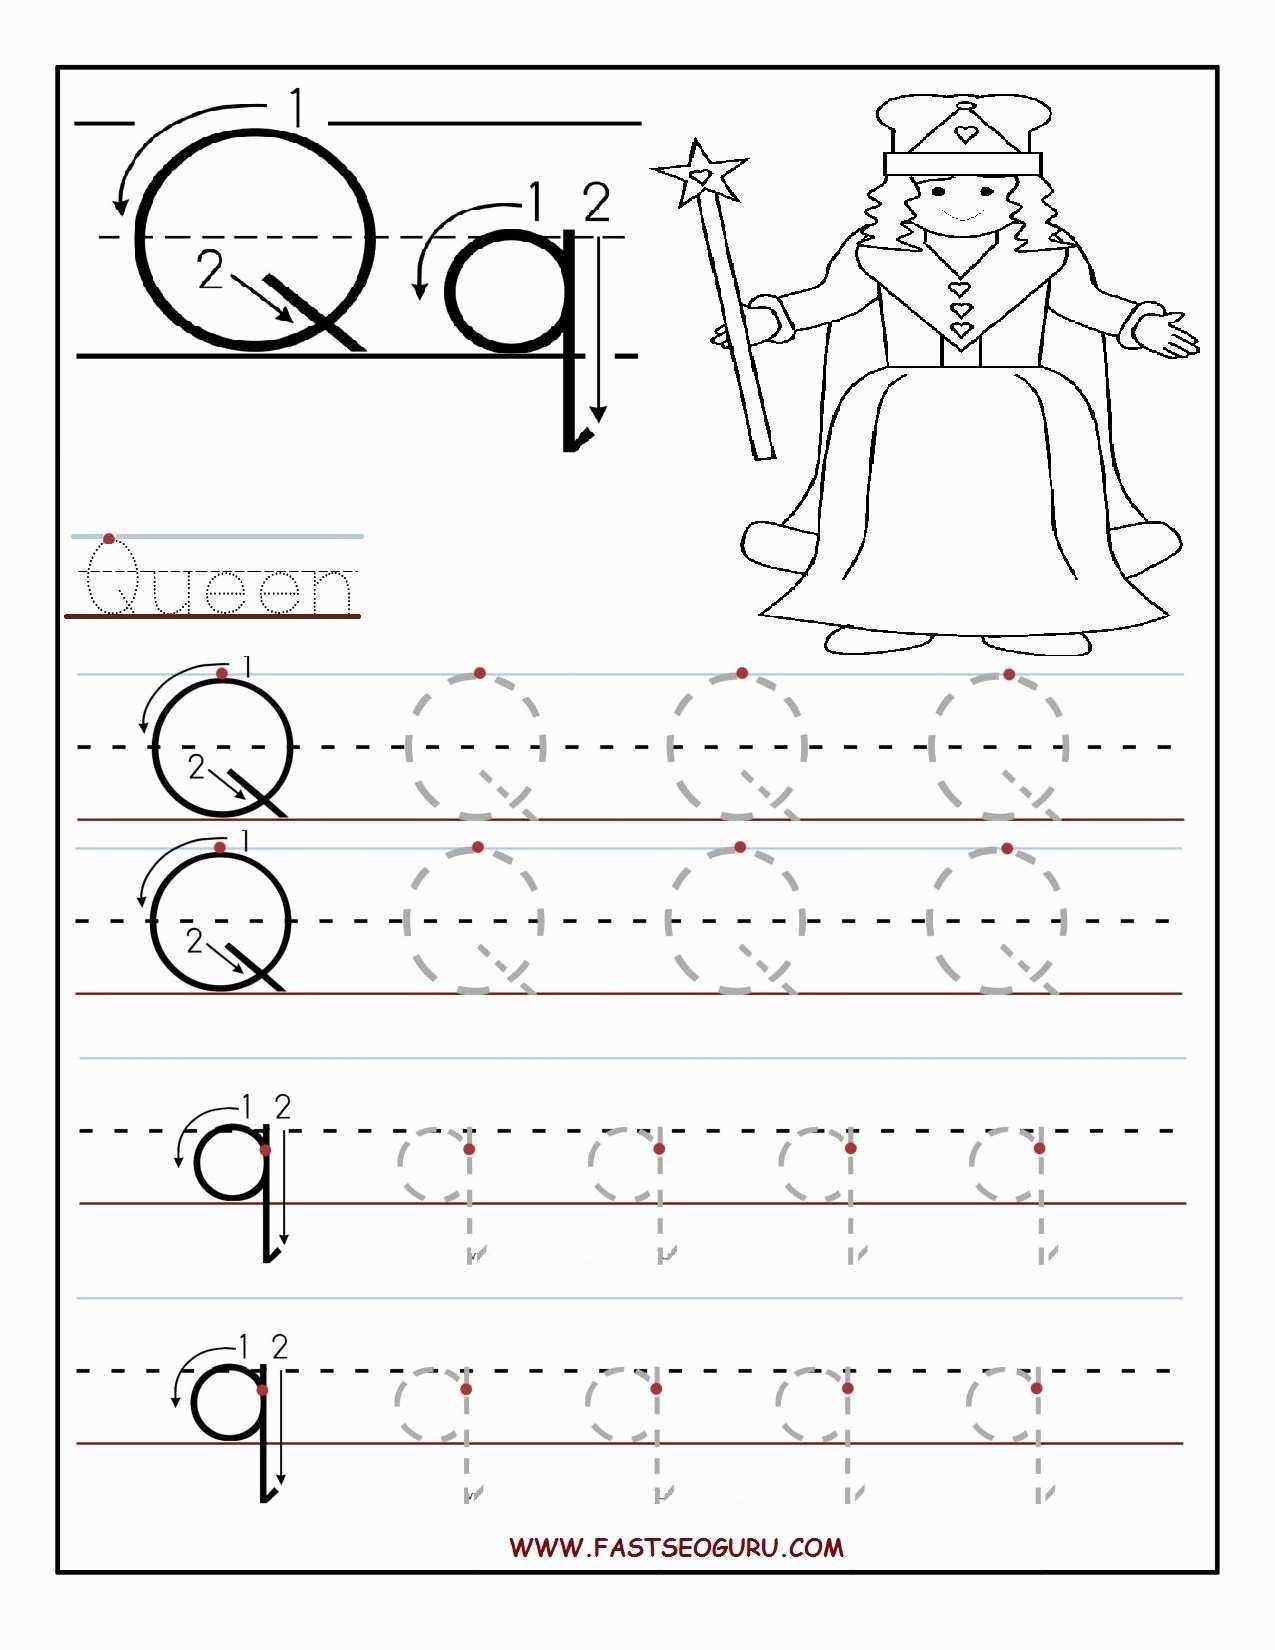 medium resolution of Alphabet Tracing Worksheets For 3 Year Olds – Letter Worksheets